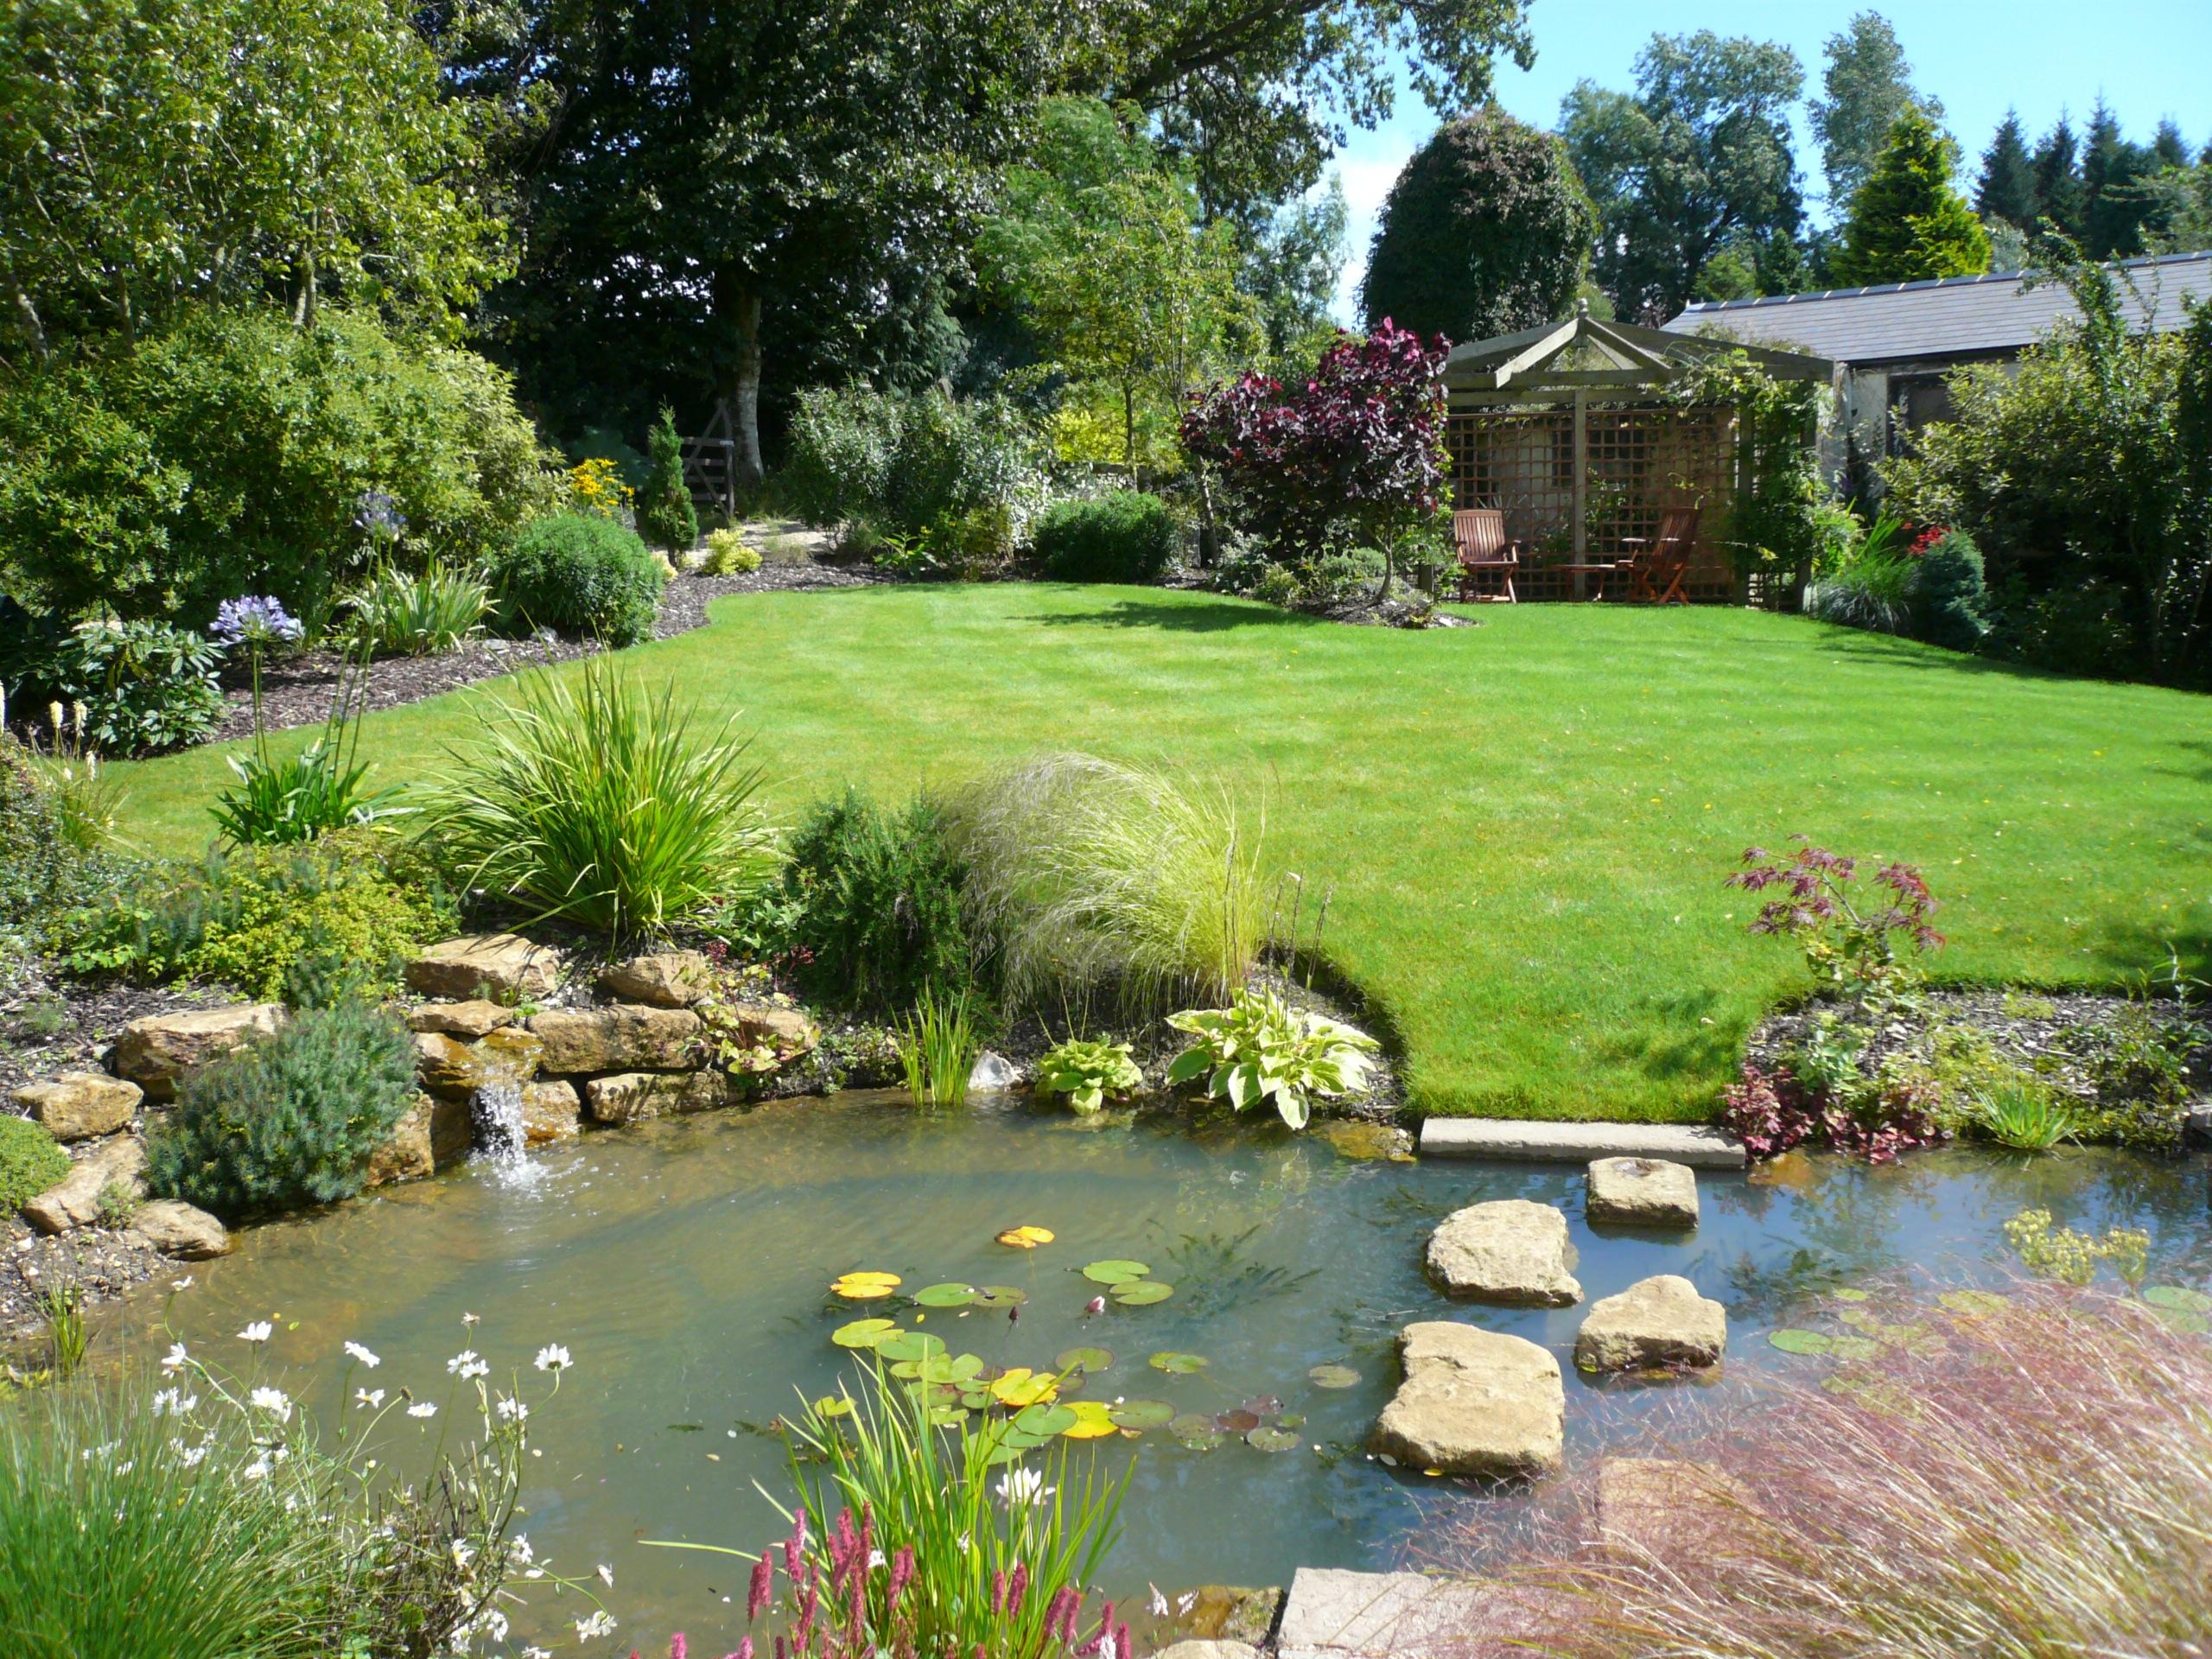 garden landscape design appealing garden landscaping to enhance its beauty - carehomedecor ZZQJFTW